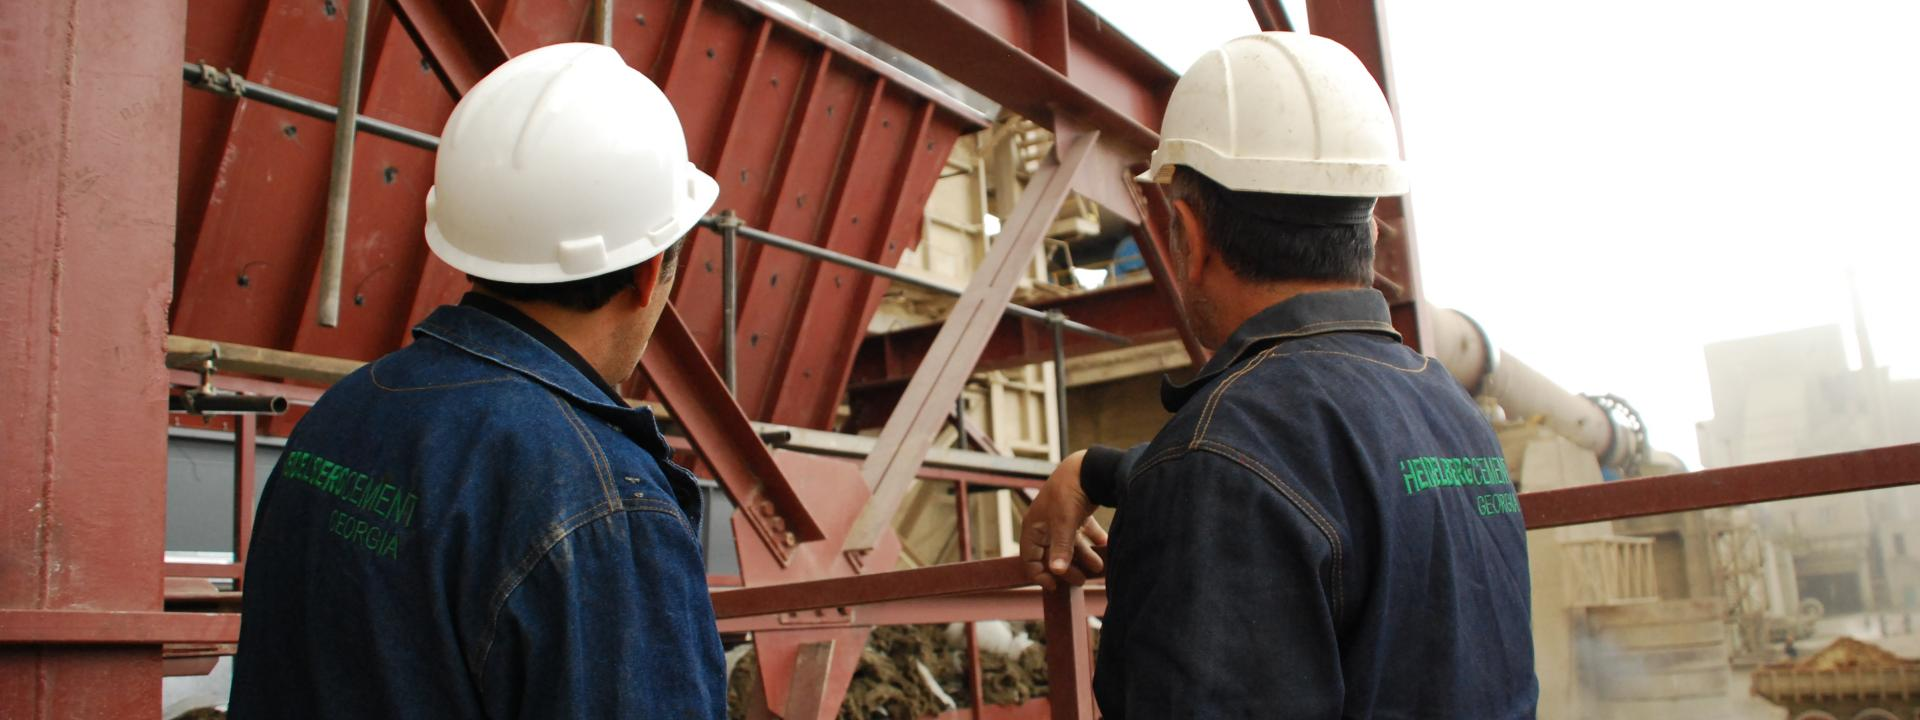 HeidelbergCement plant workers.